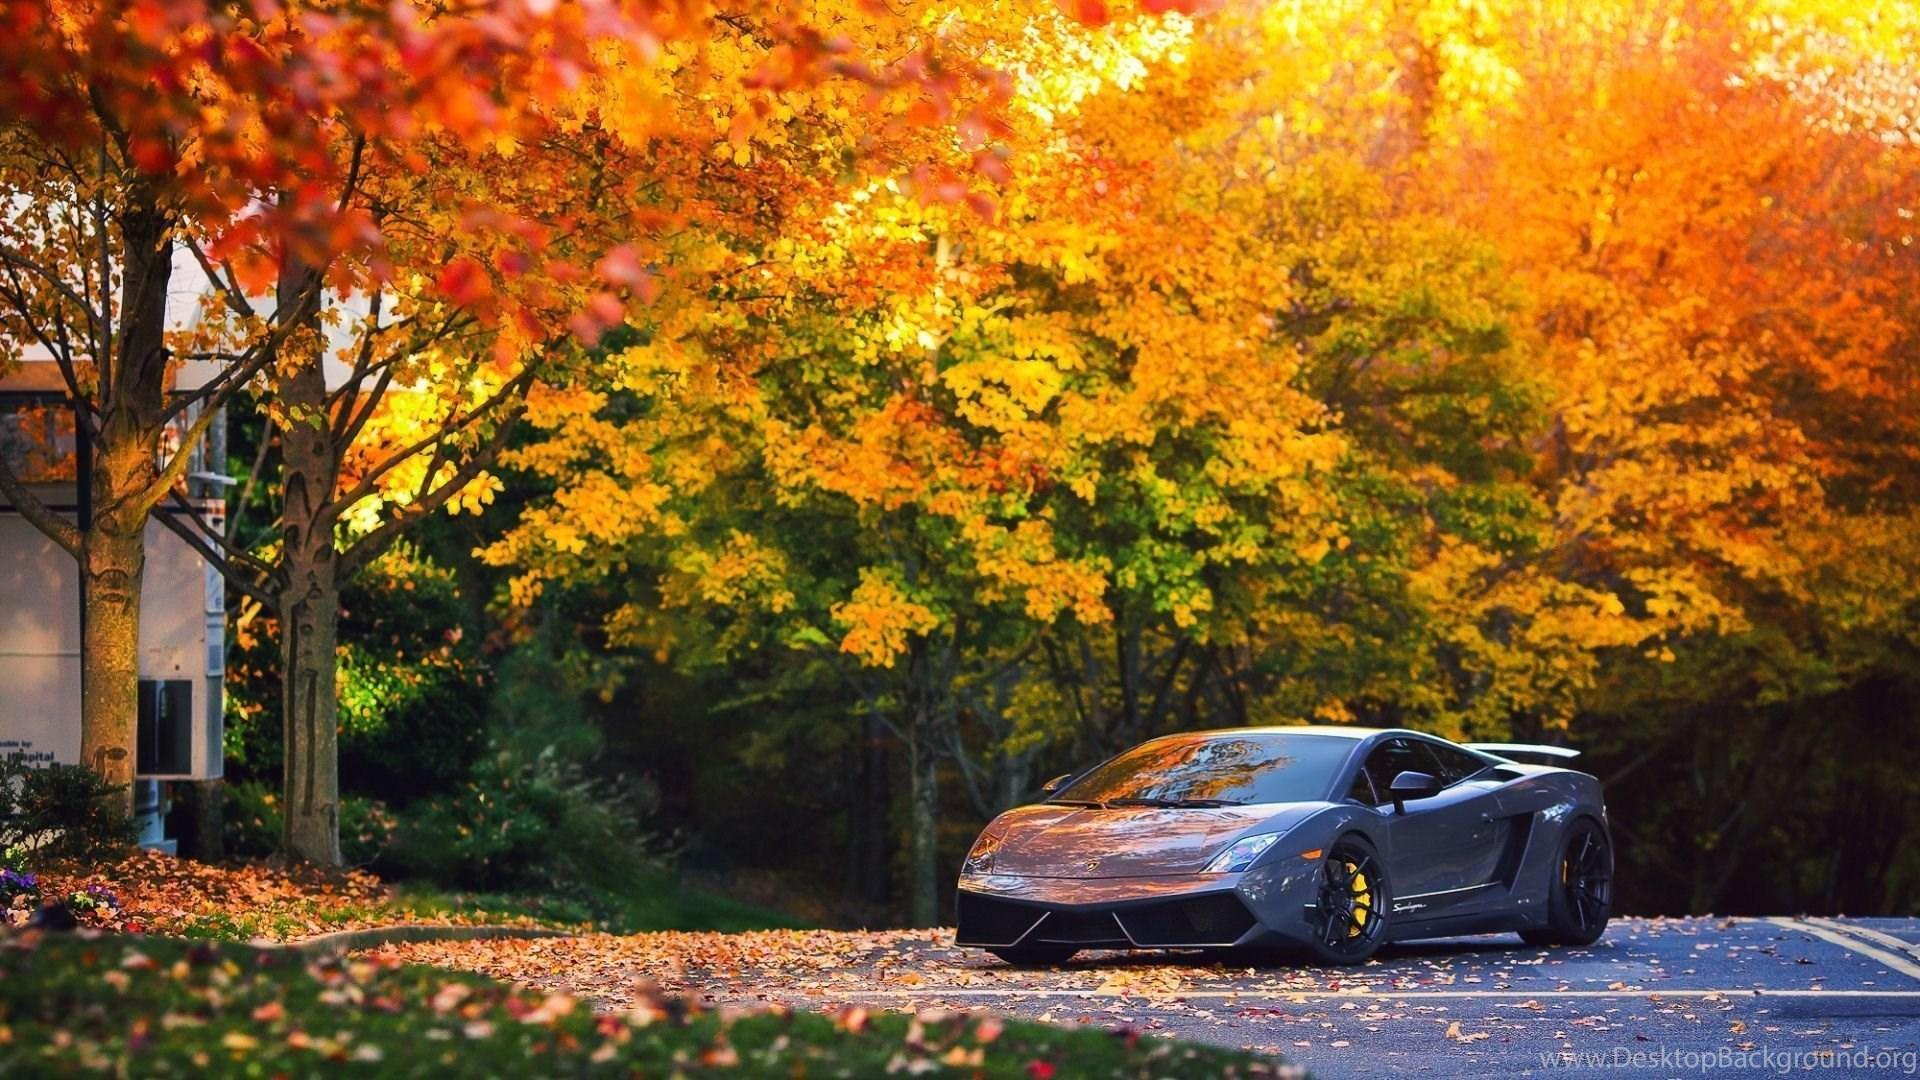 Full Hd 1080p Lamborghini Wallpapers Hd Desktop Backgrounds